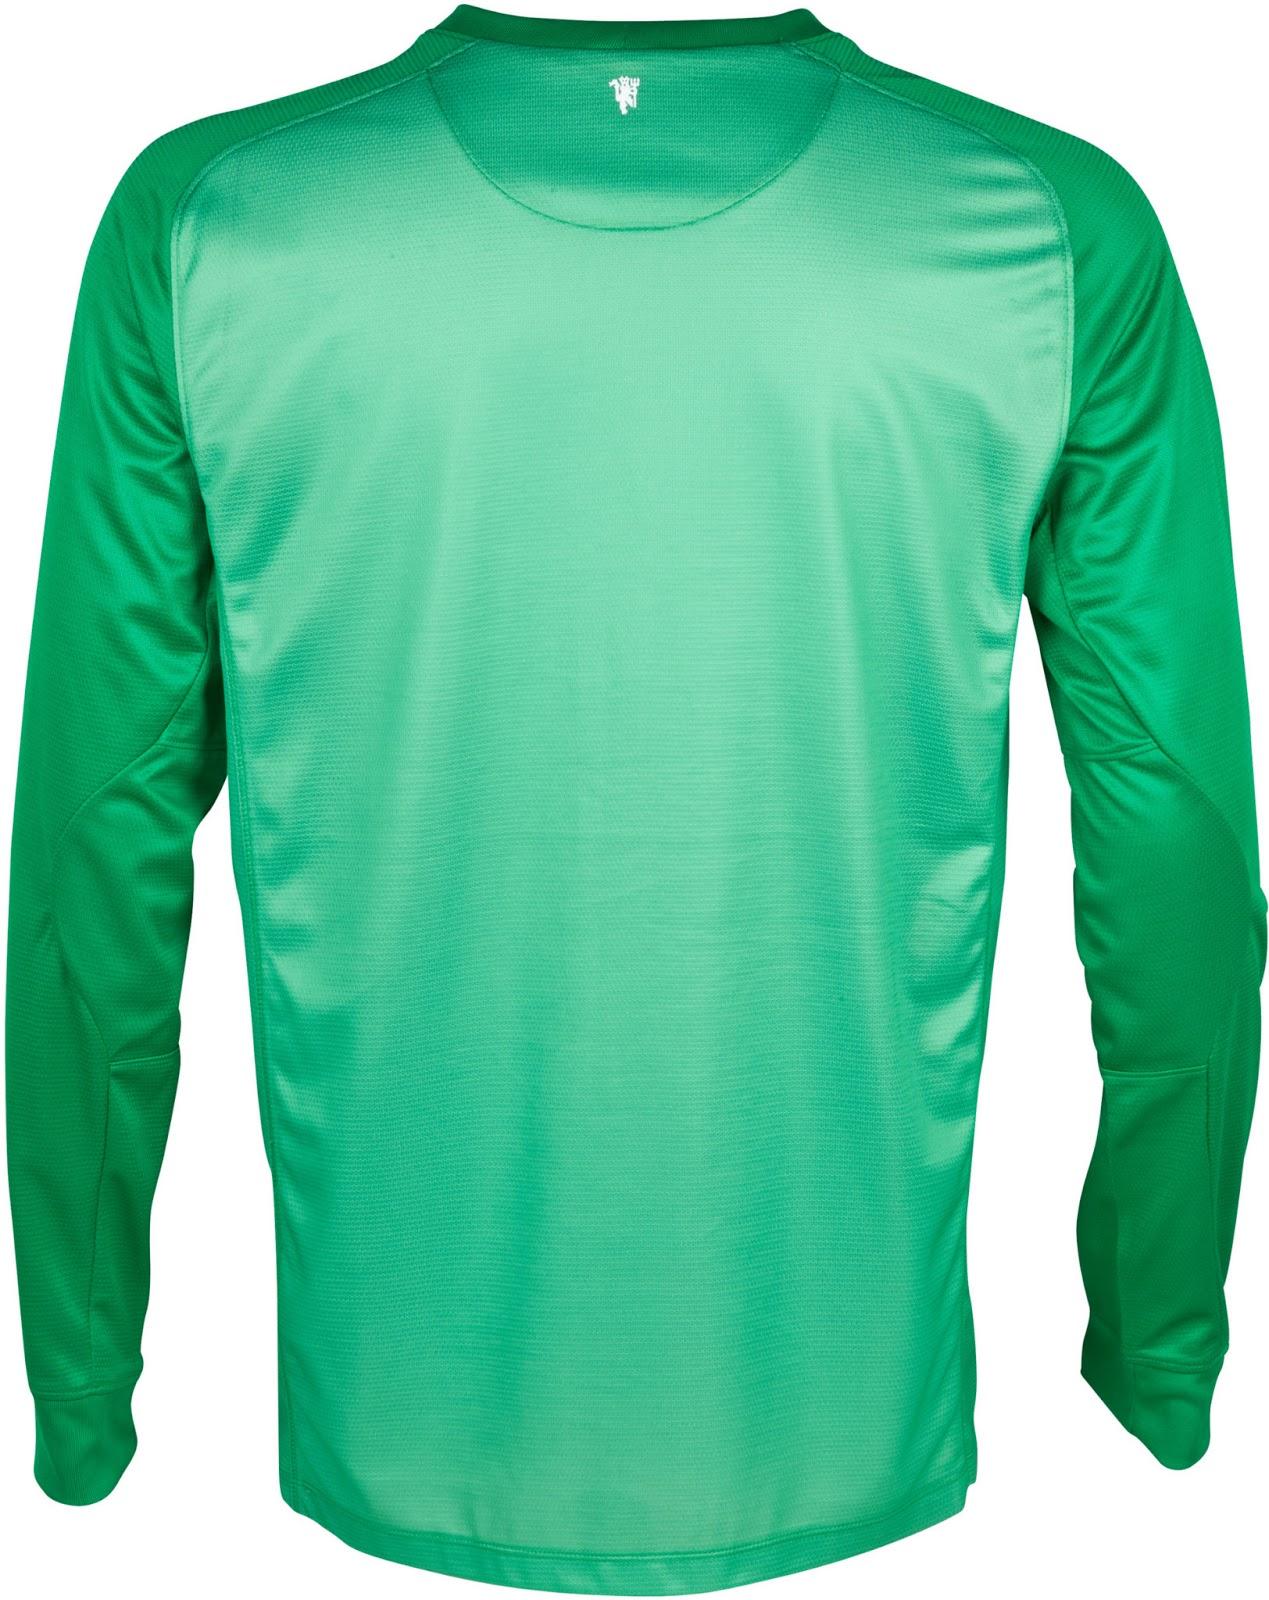 Manchester united 13 14 2013 14 home kit goalkeeper kits released